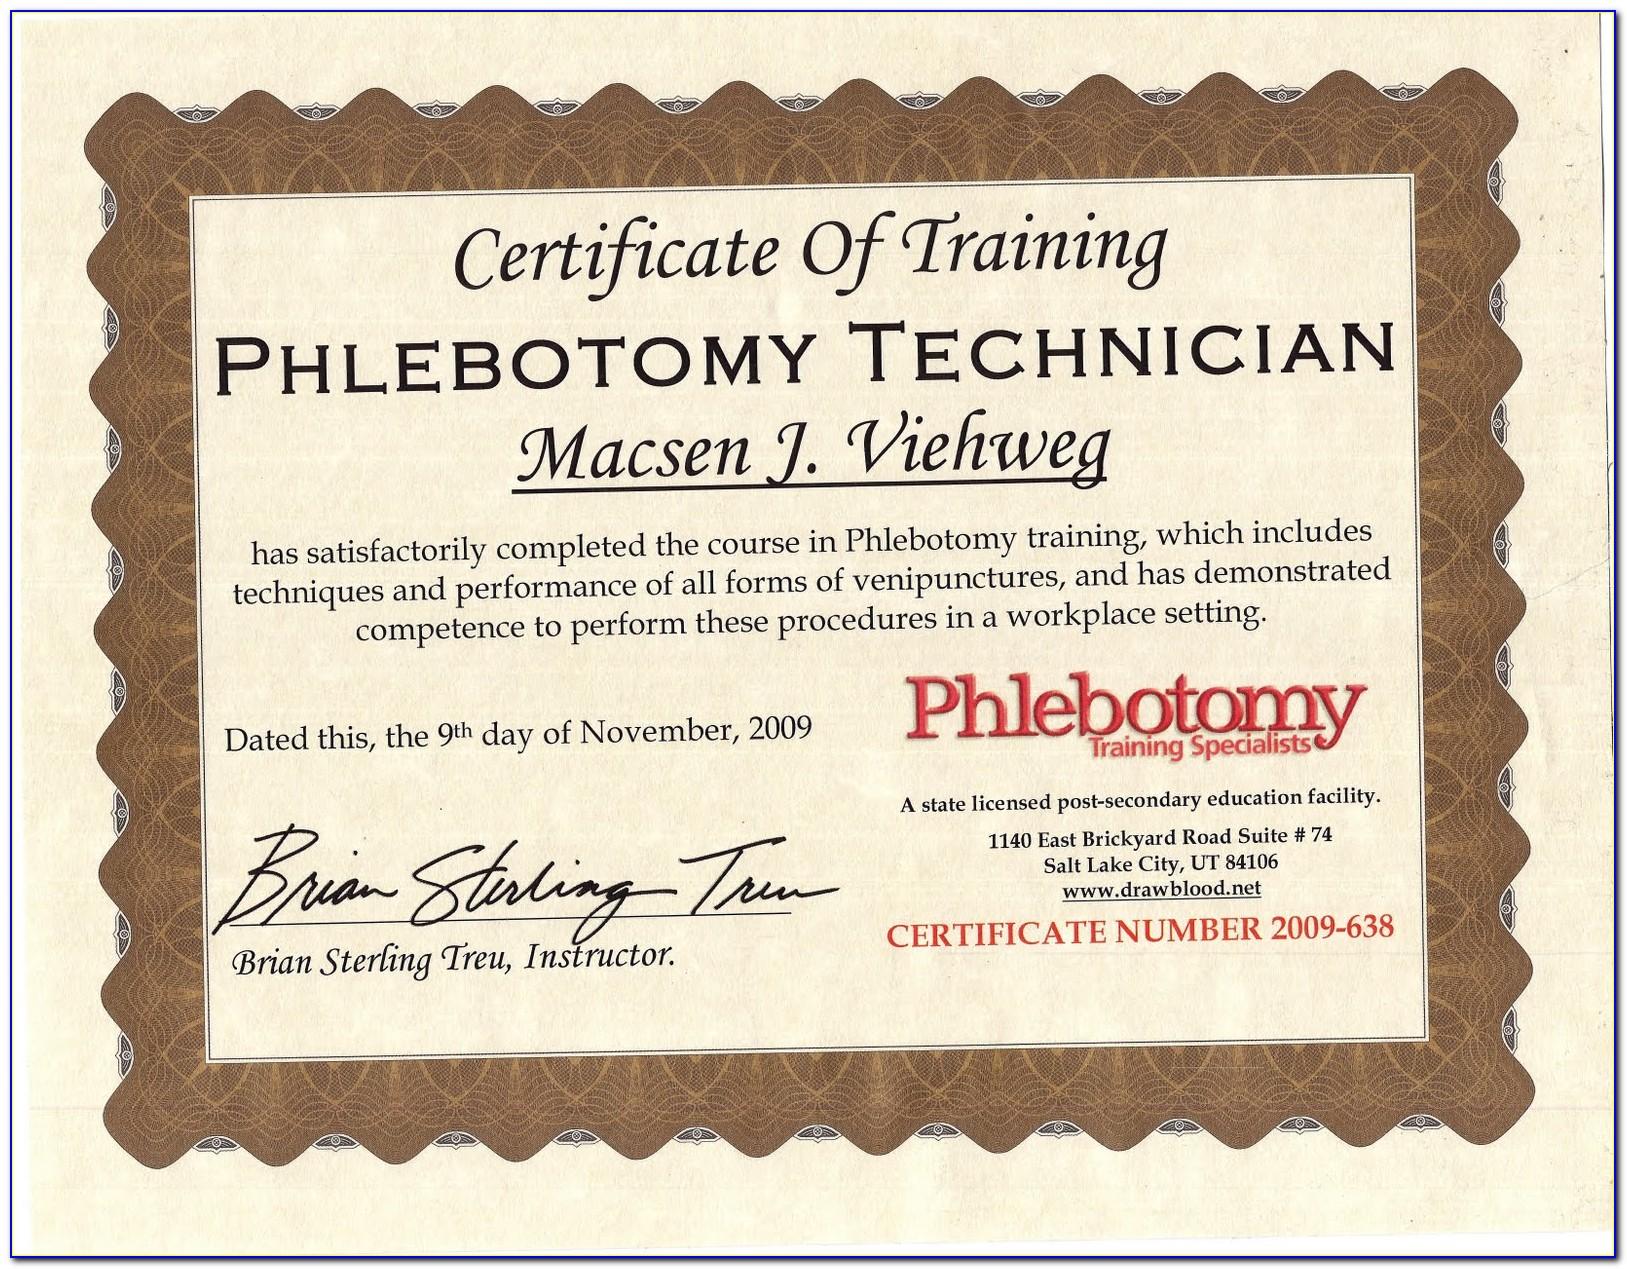 Iv Certification For Phlebotomist